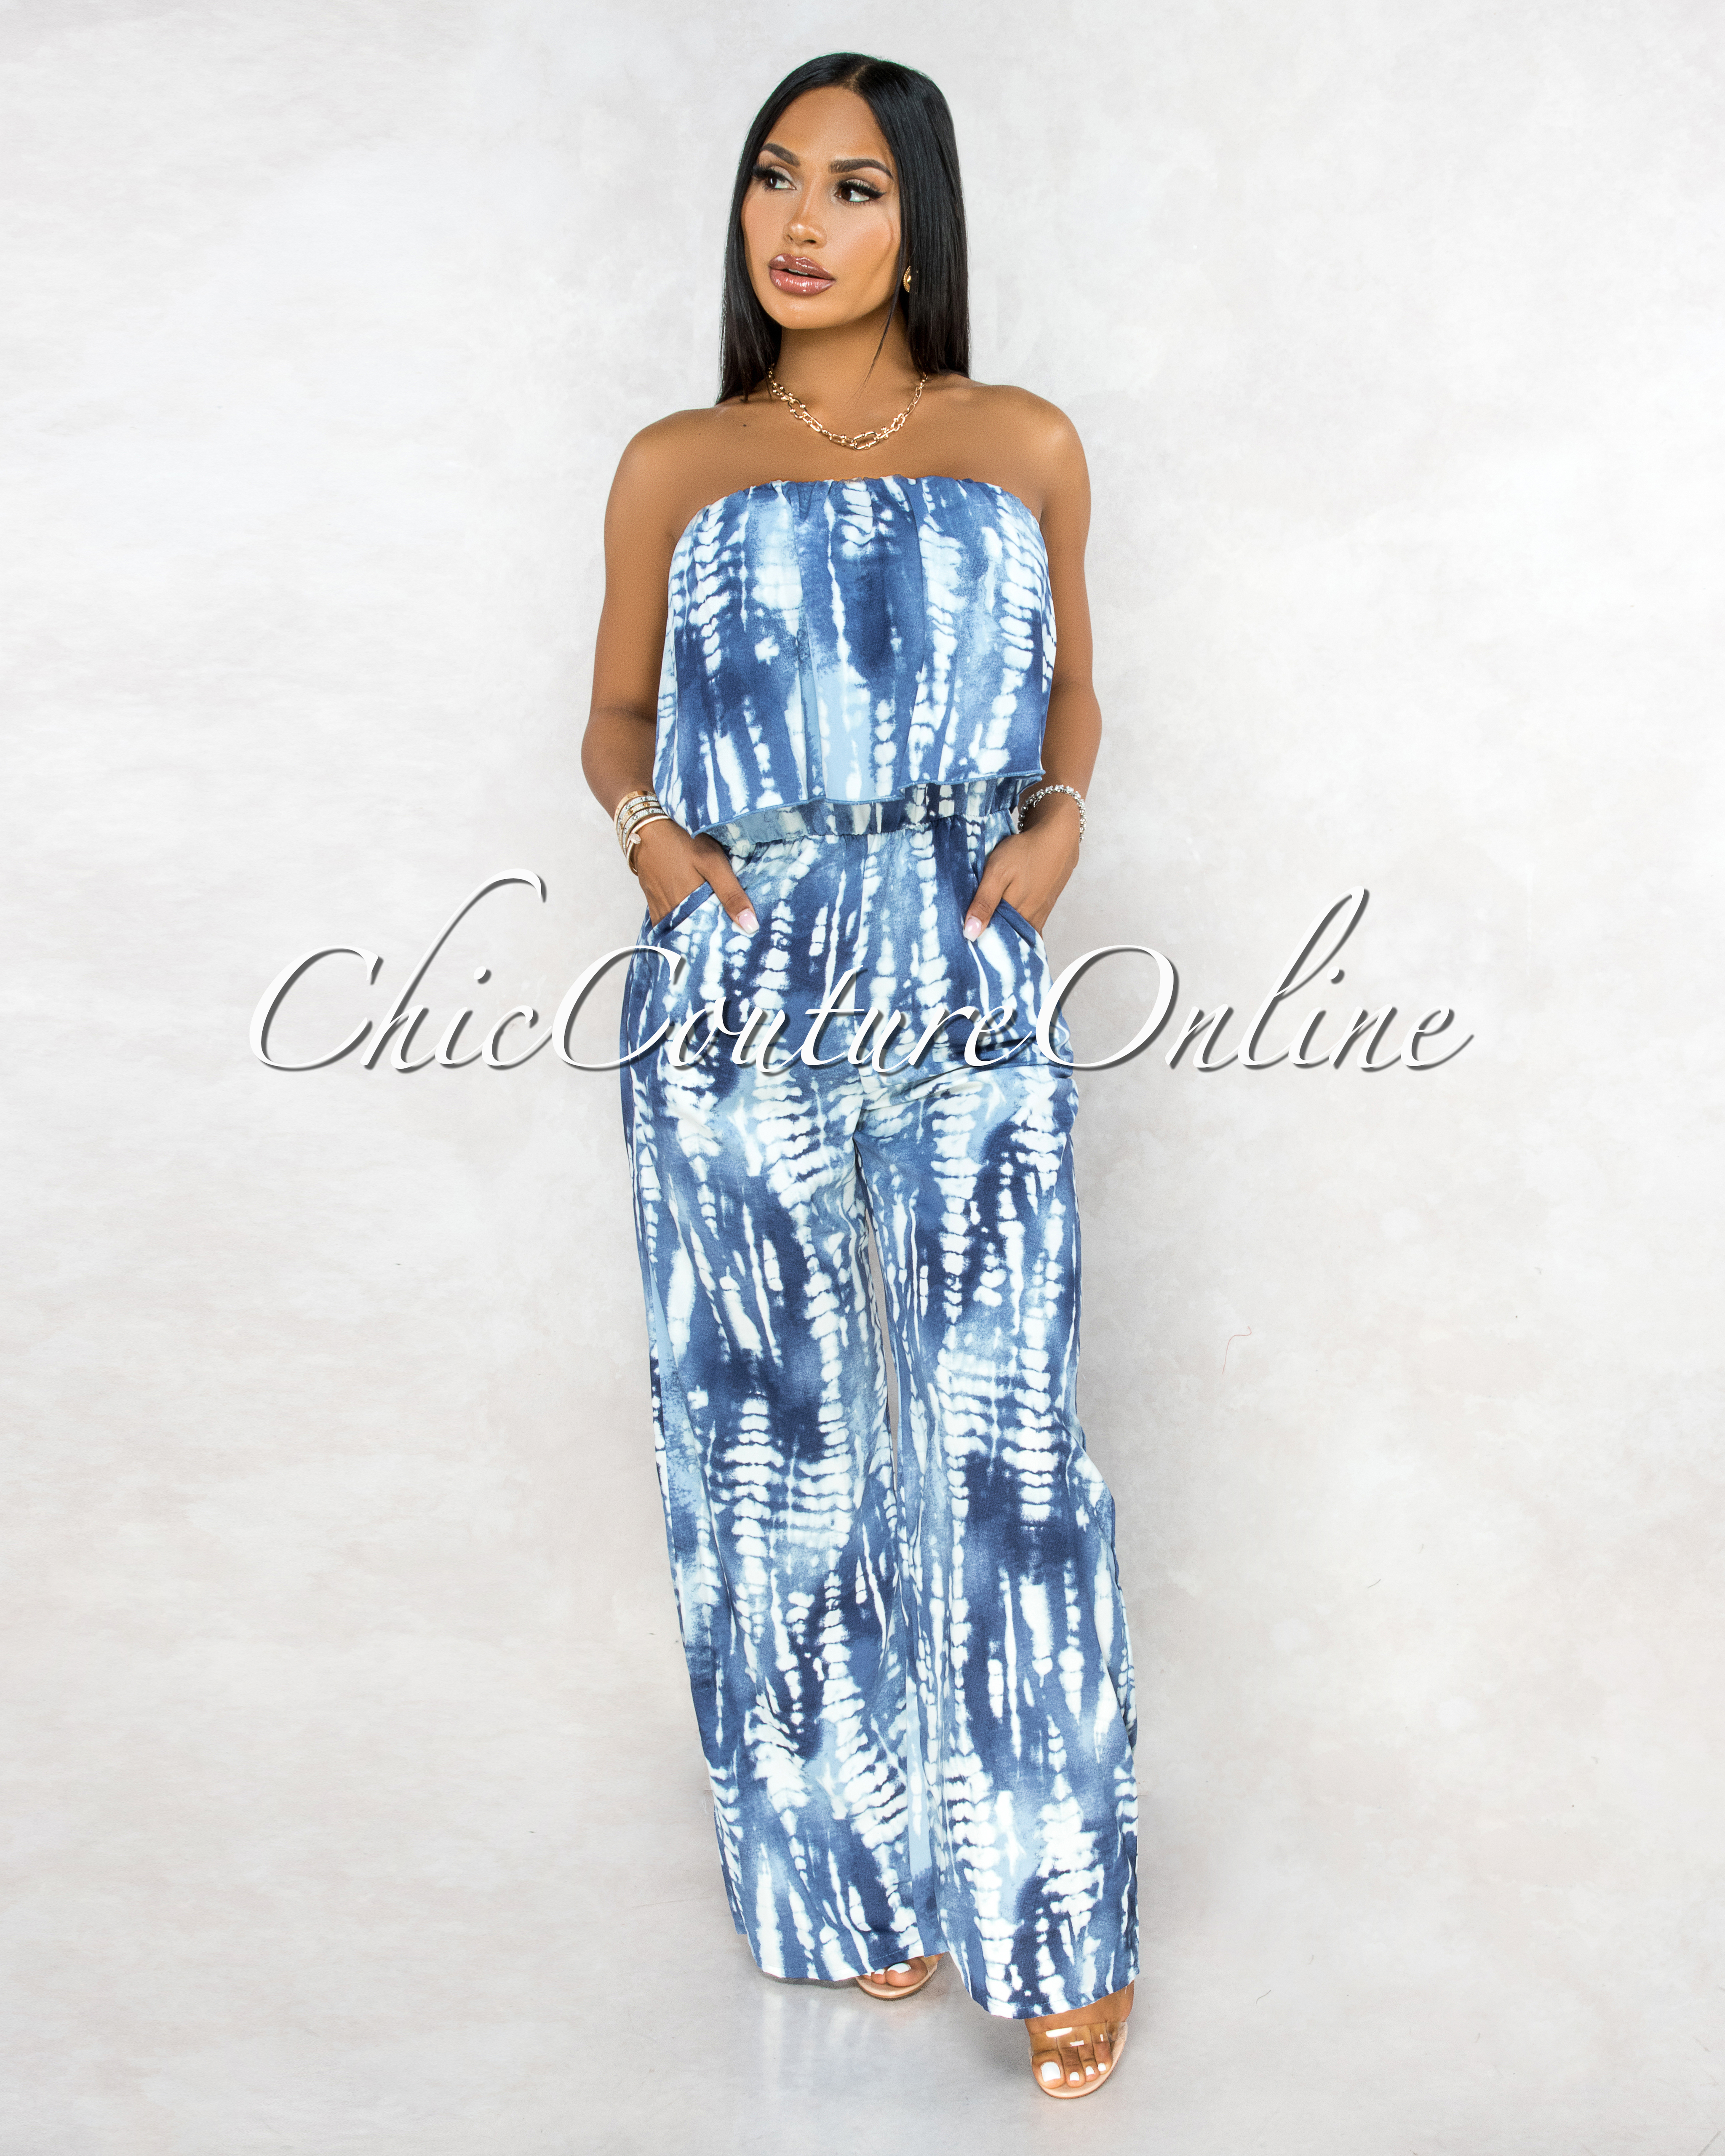 Roman Blue White Tie-Dye Overlay Top Strapless Jumpsuit